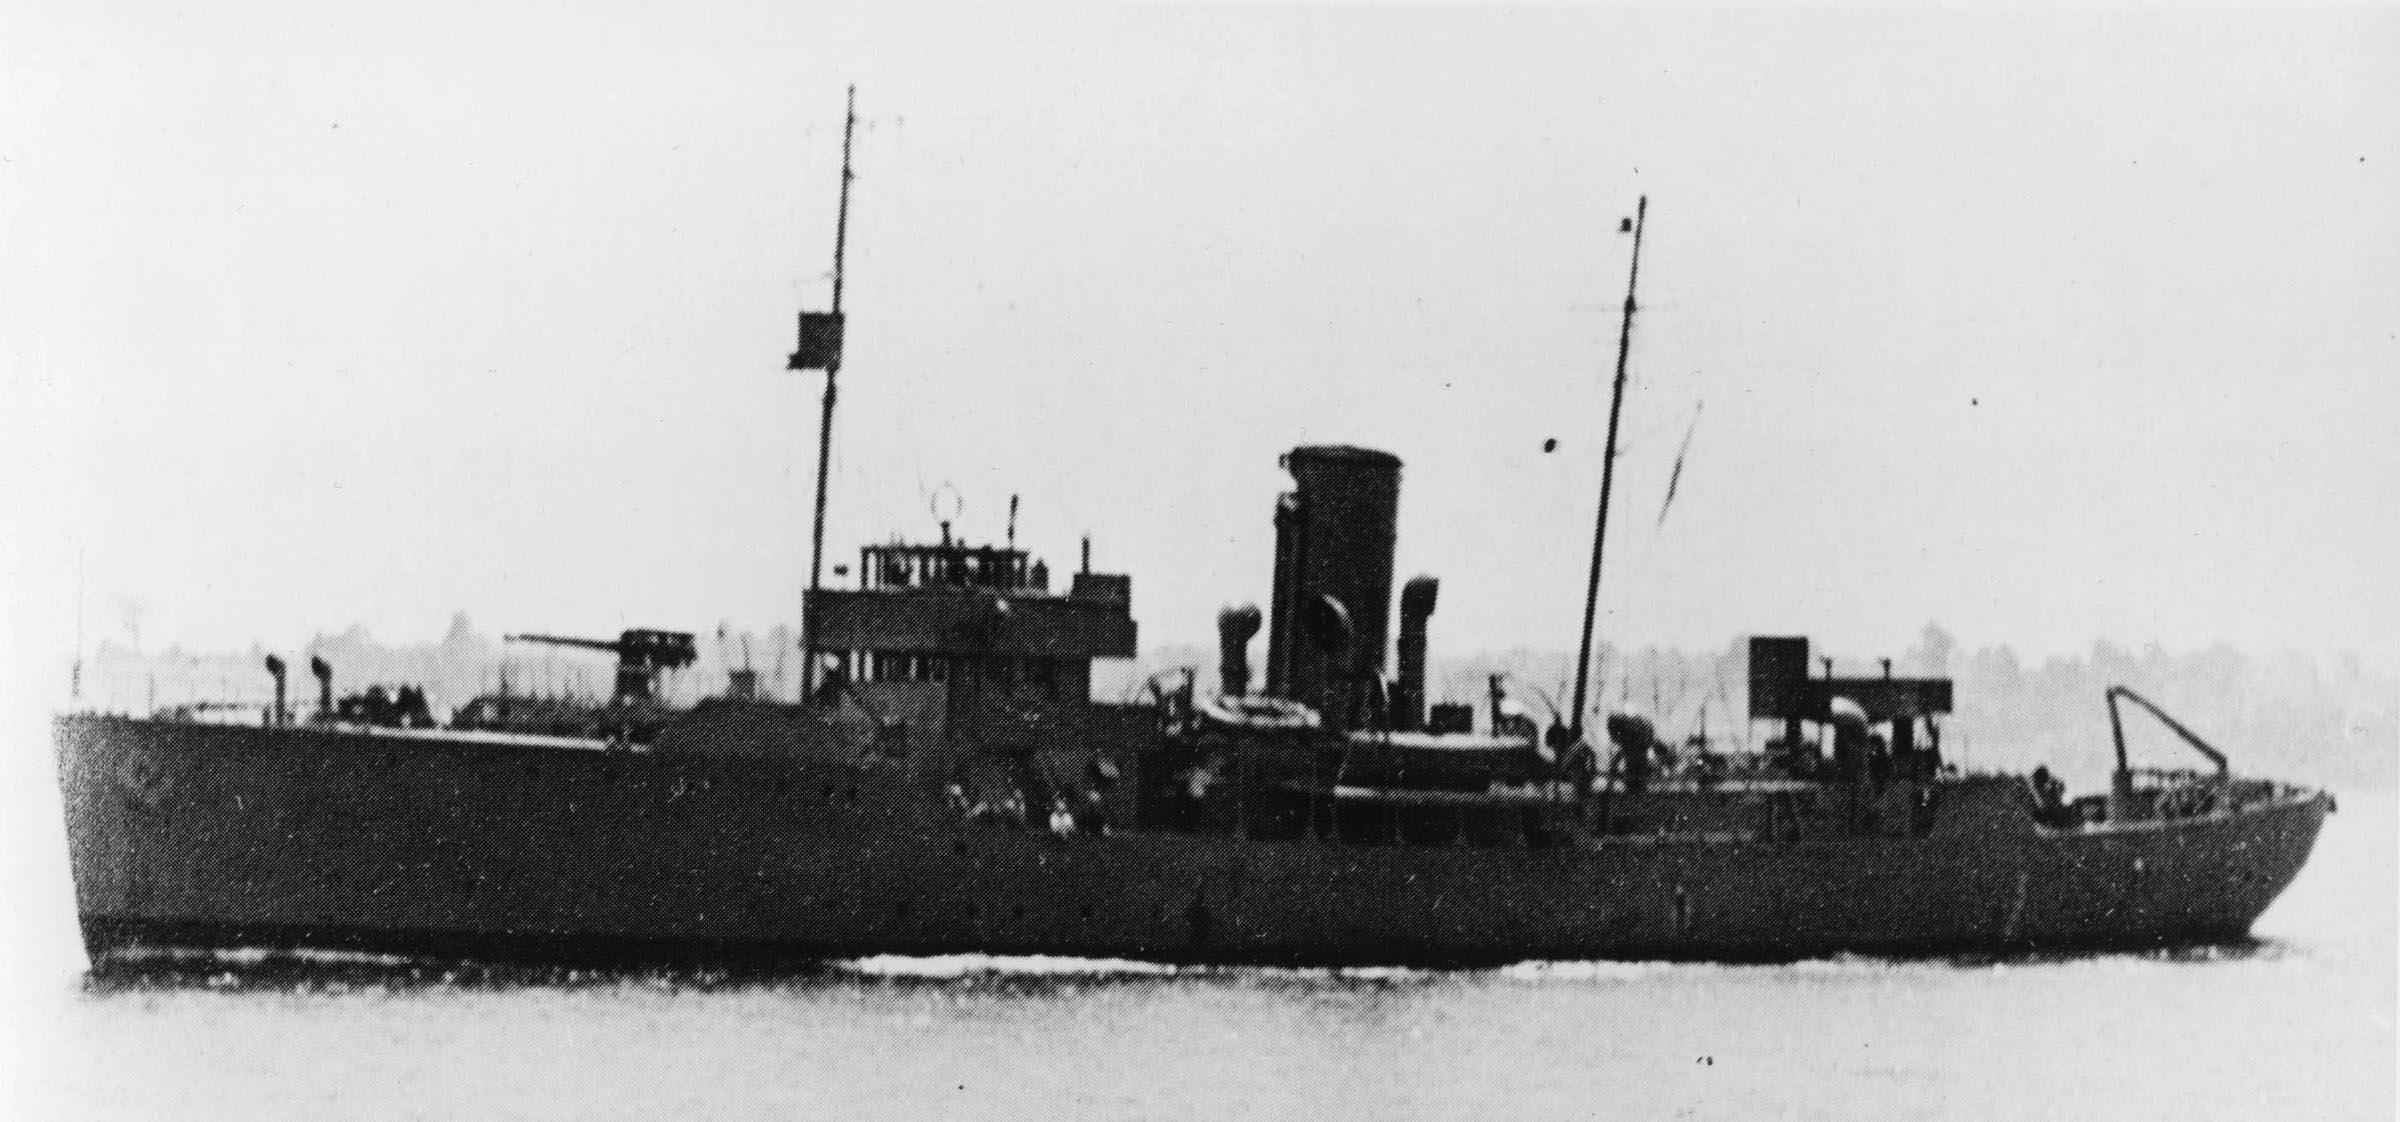 HMCS PRESCOTT